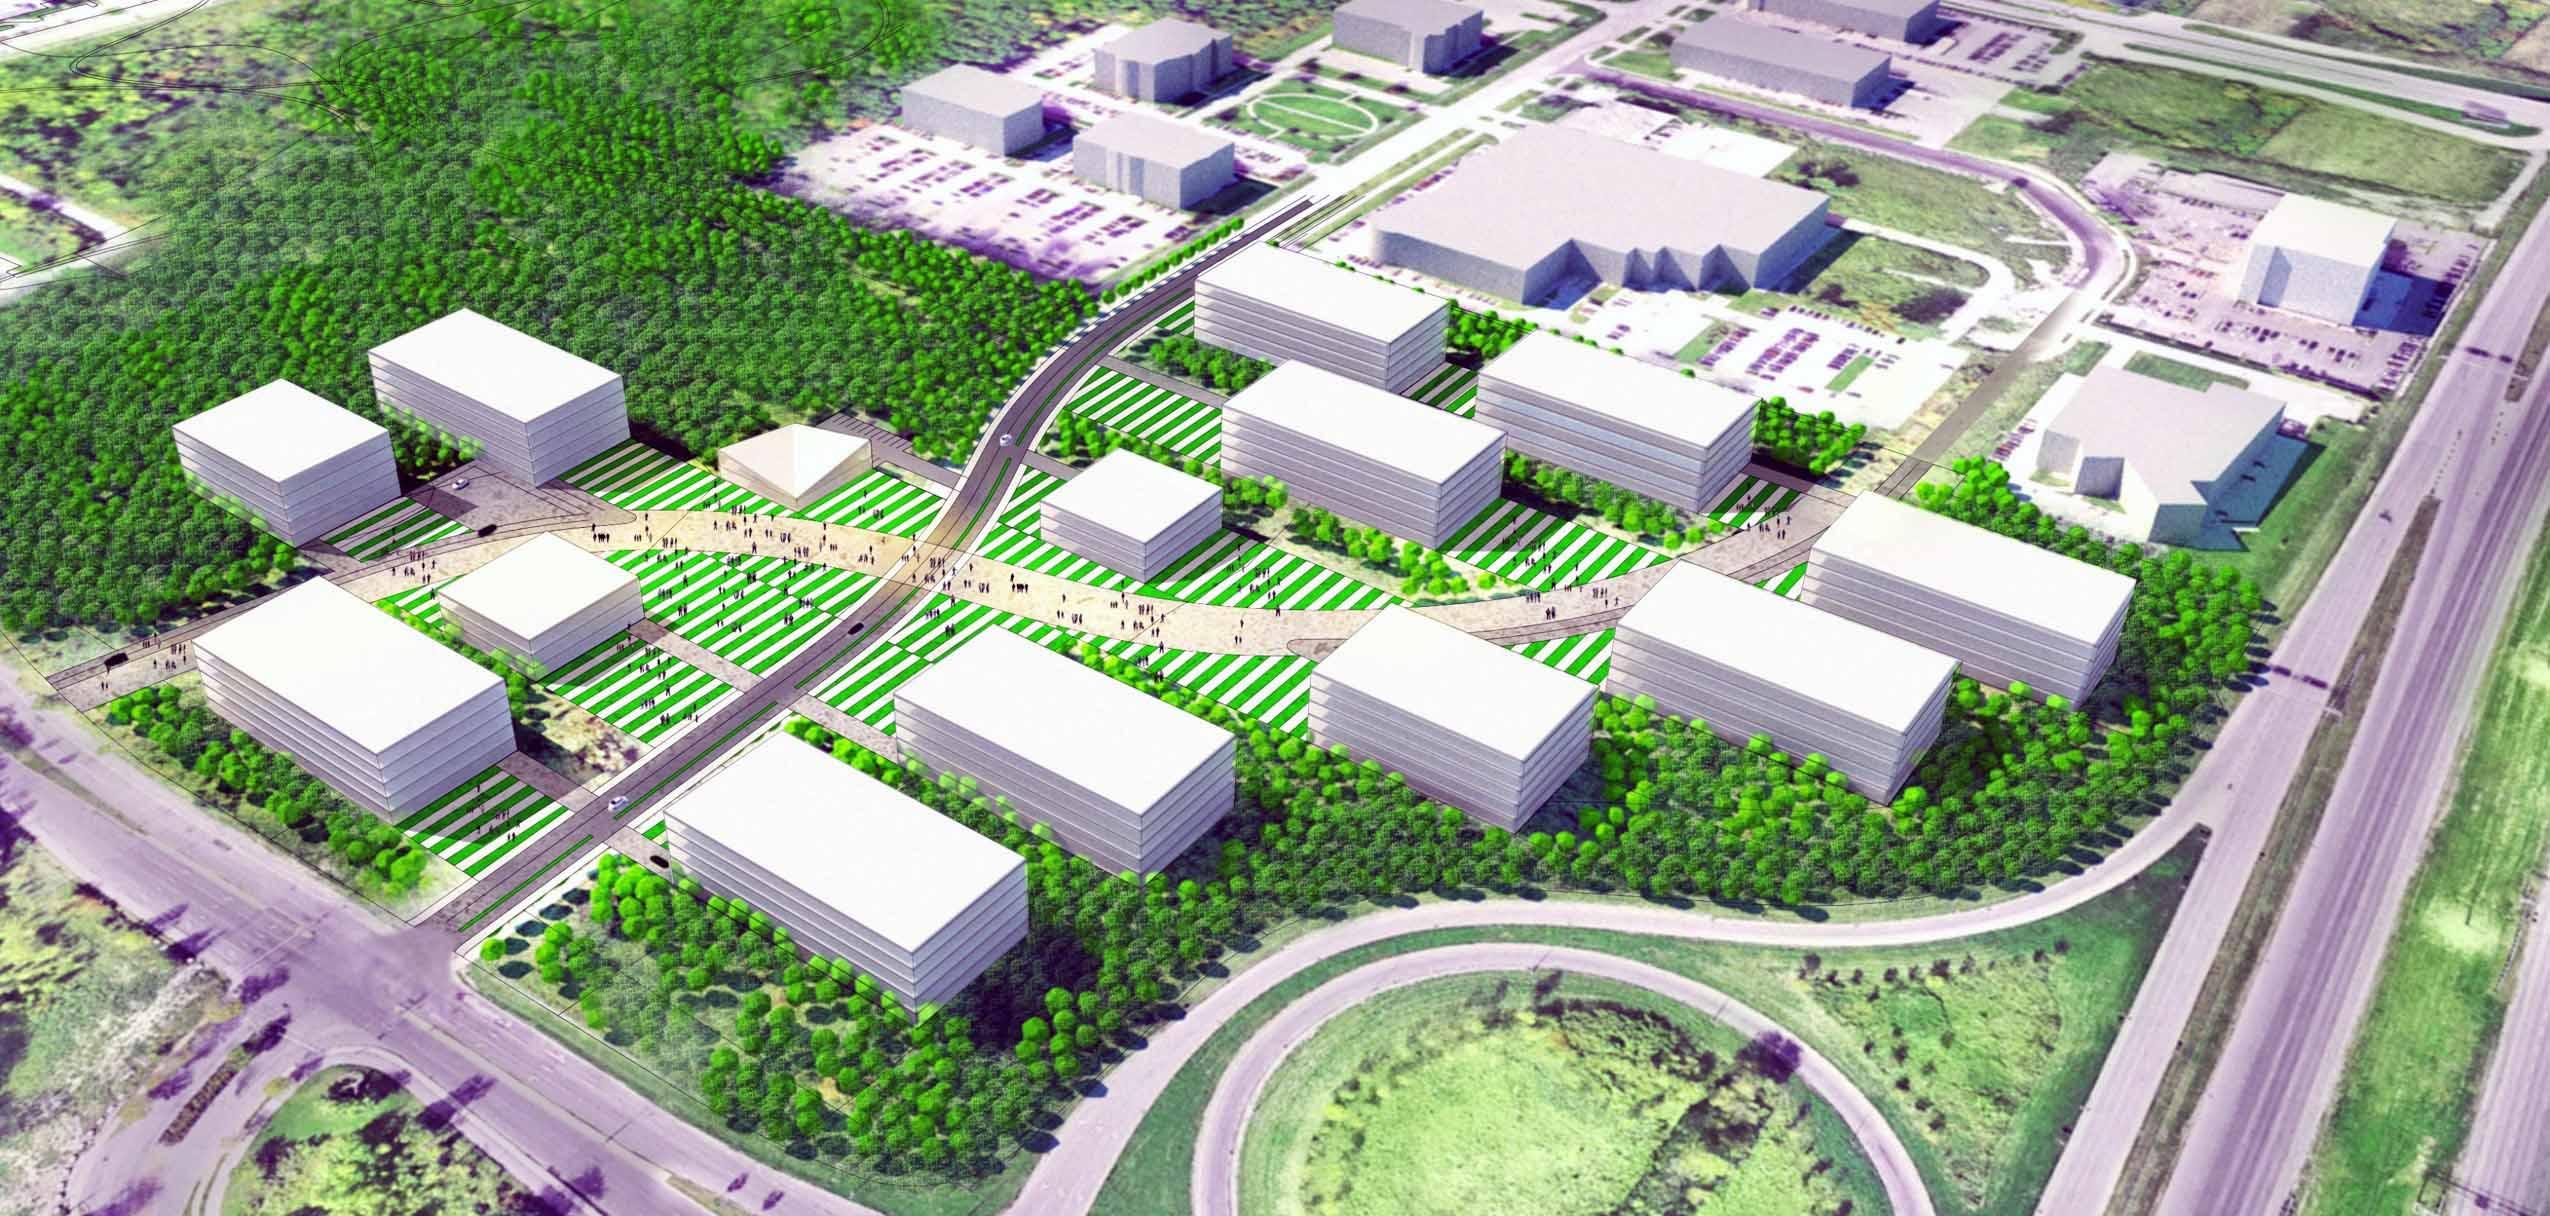 Laval is hoping Moderna will build a facility at Cité de la Biotech